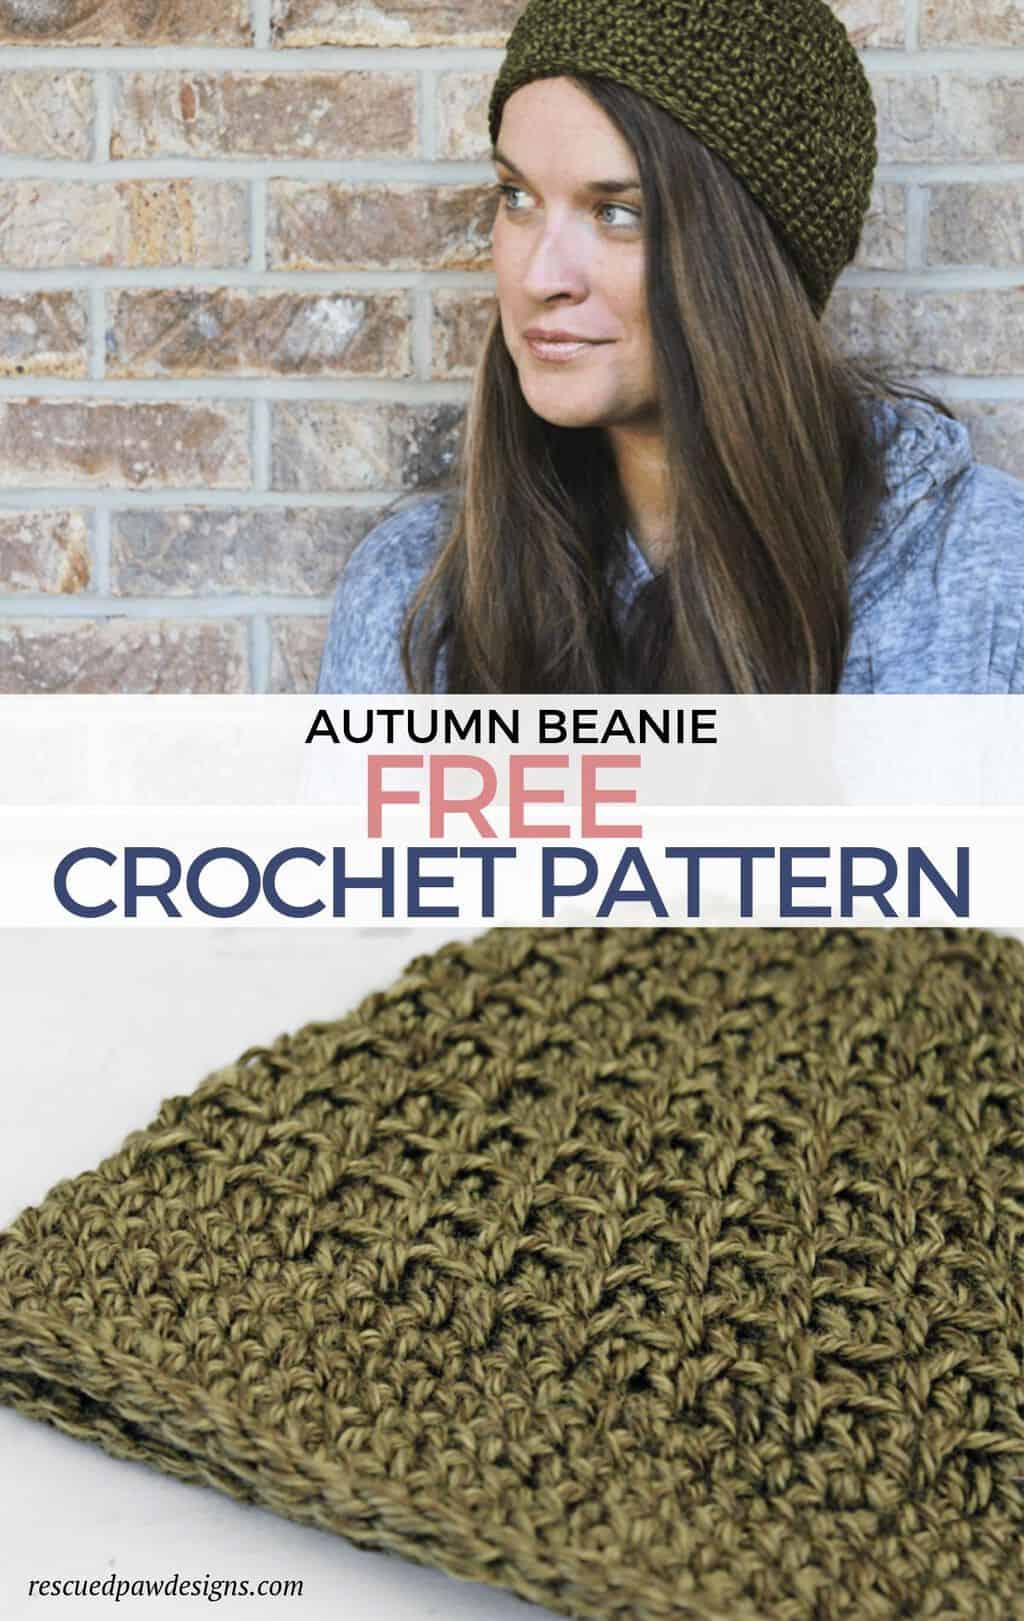 Autumn Beanie Crochet Pattern